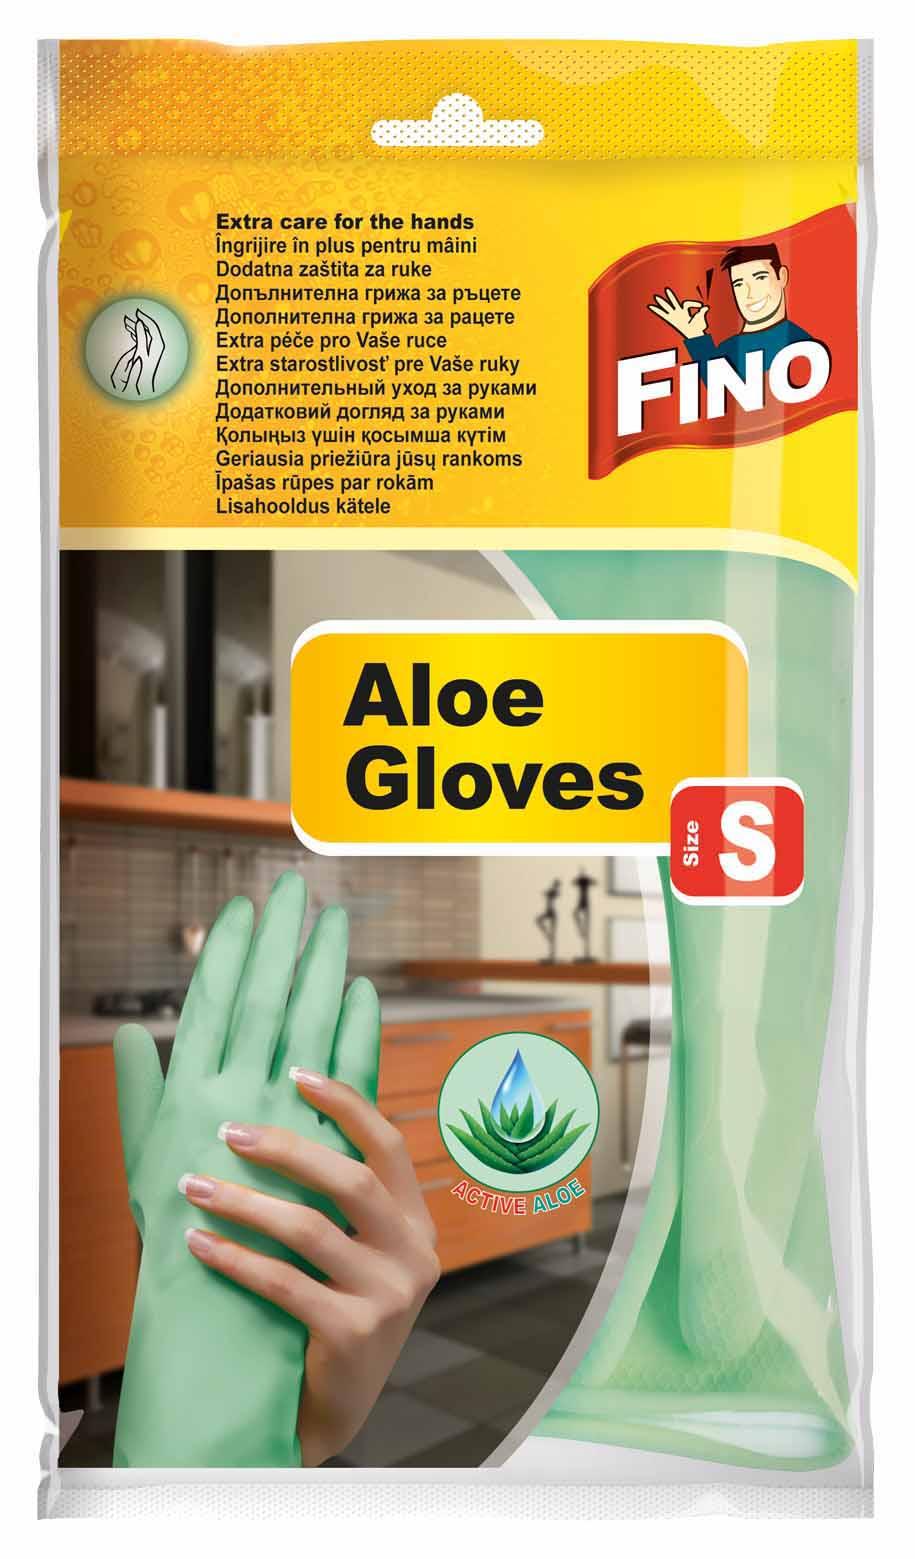 Fotografie Fino rukavice s Aloe vera S 1 pár